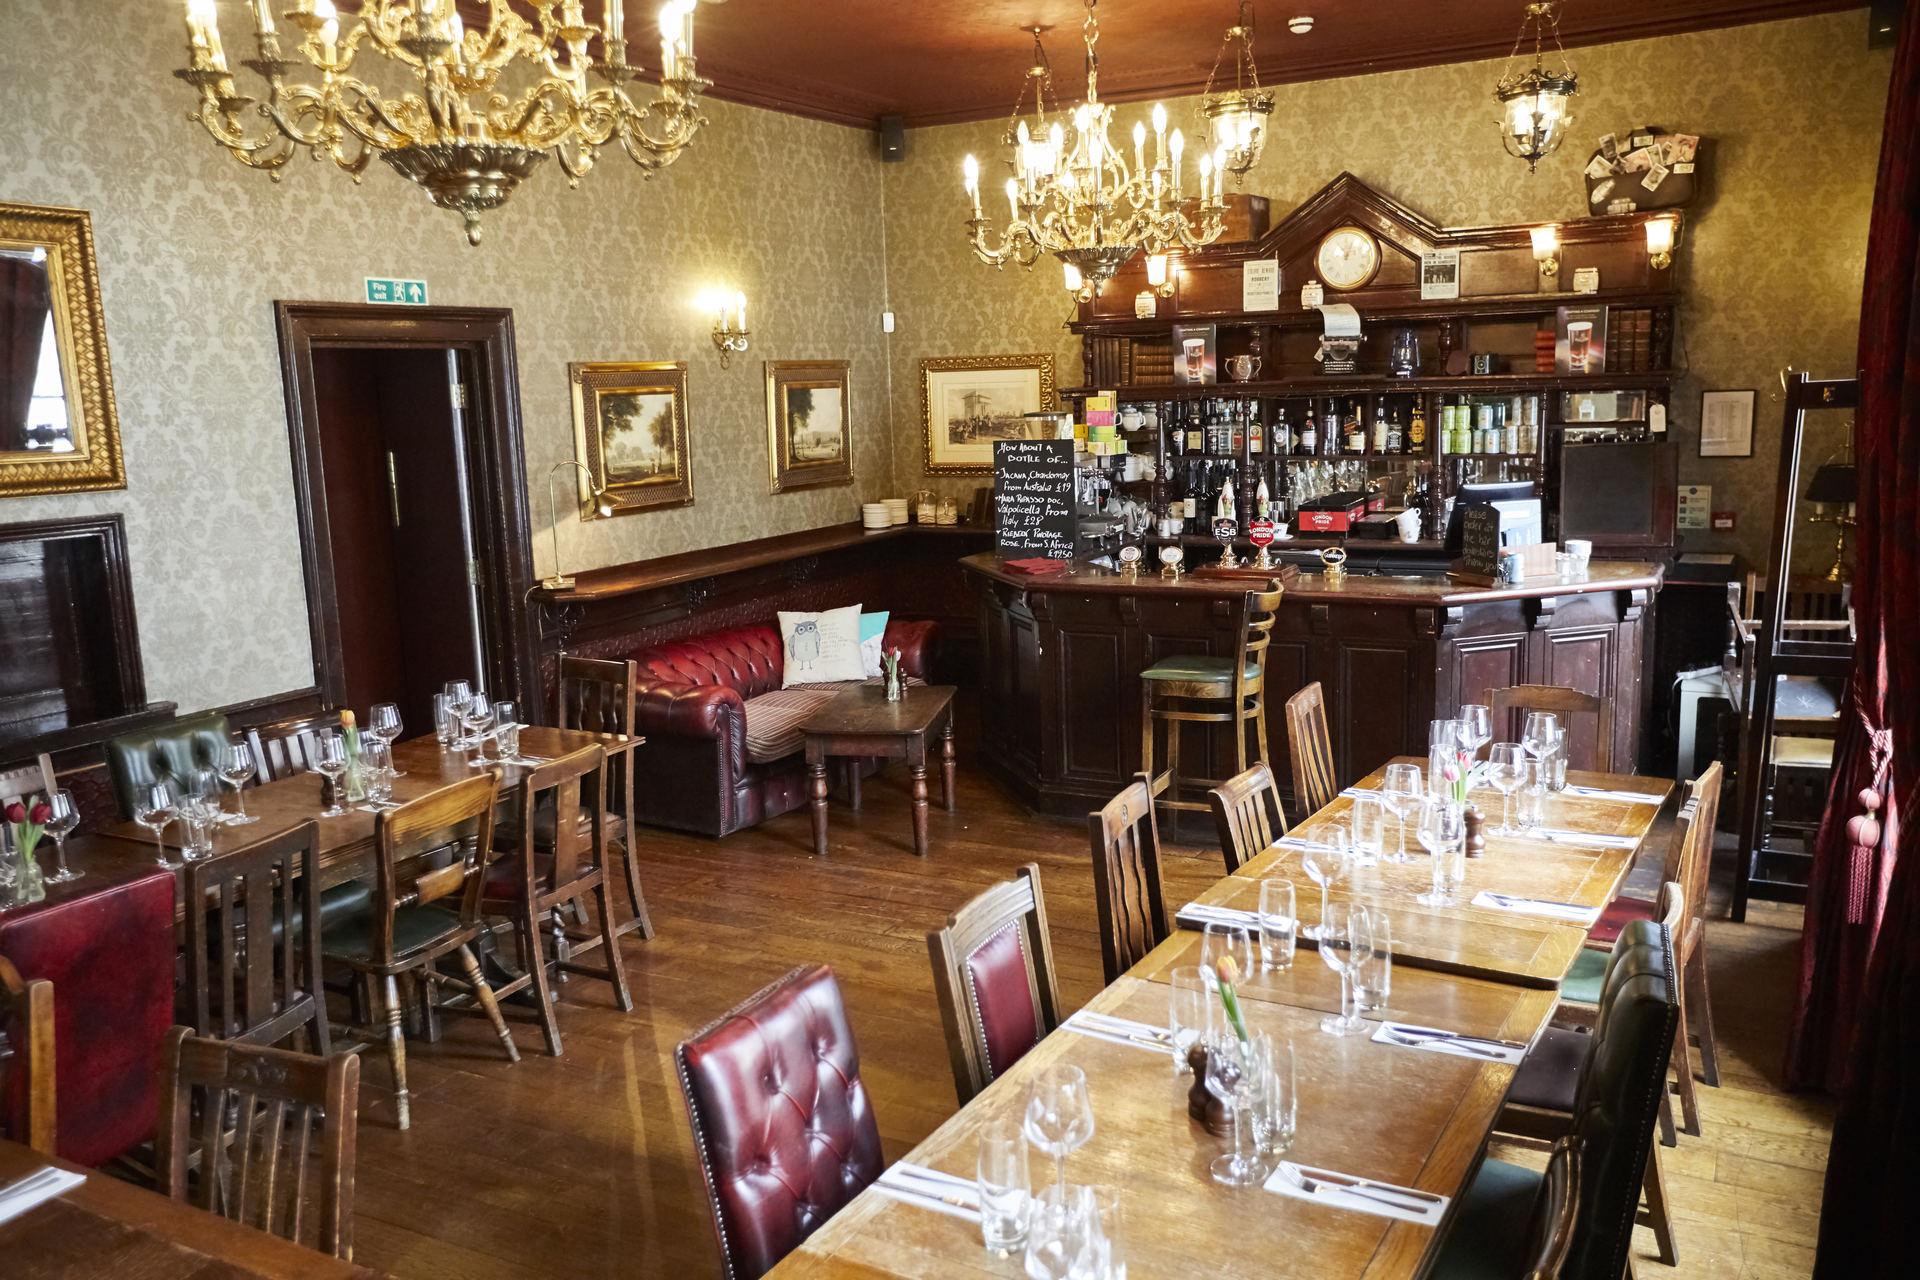 The Star Tavern - Fuller's Pub and Restaurant in Belgravia